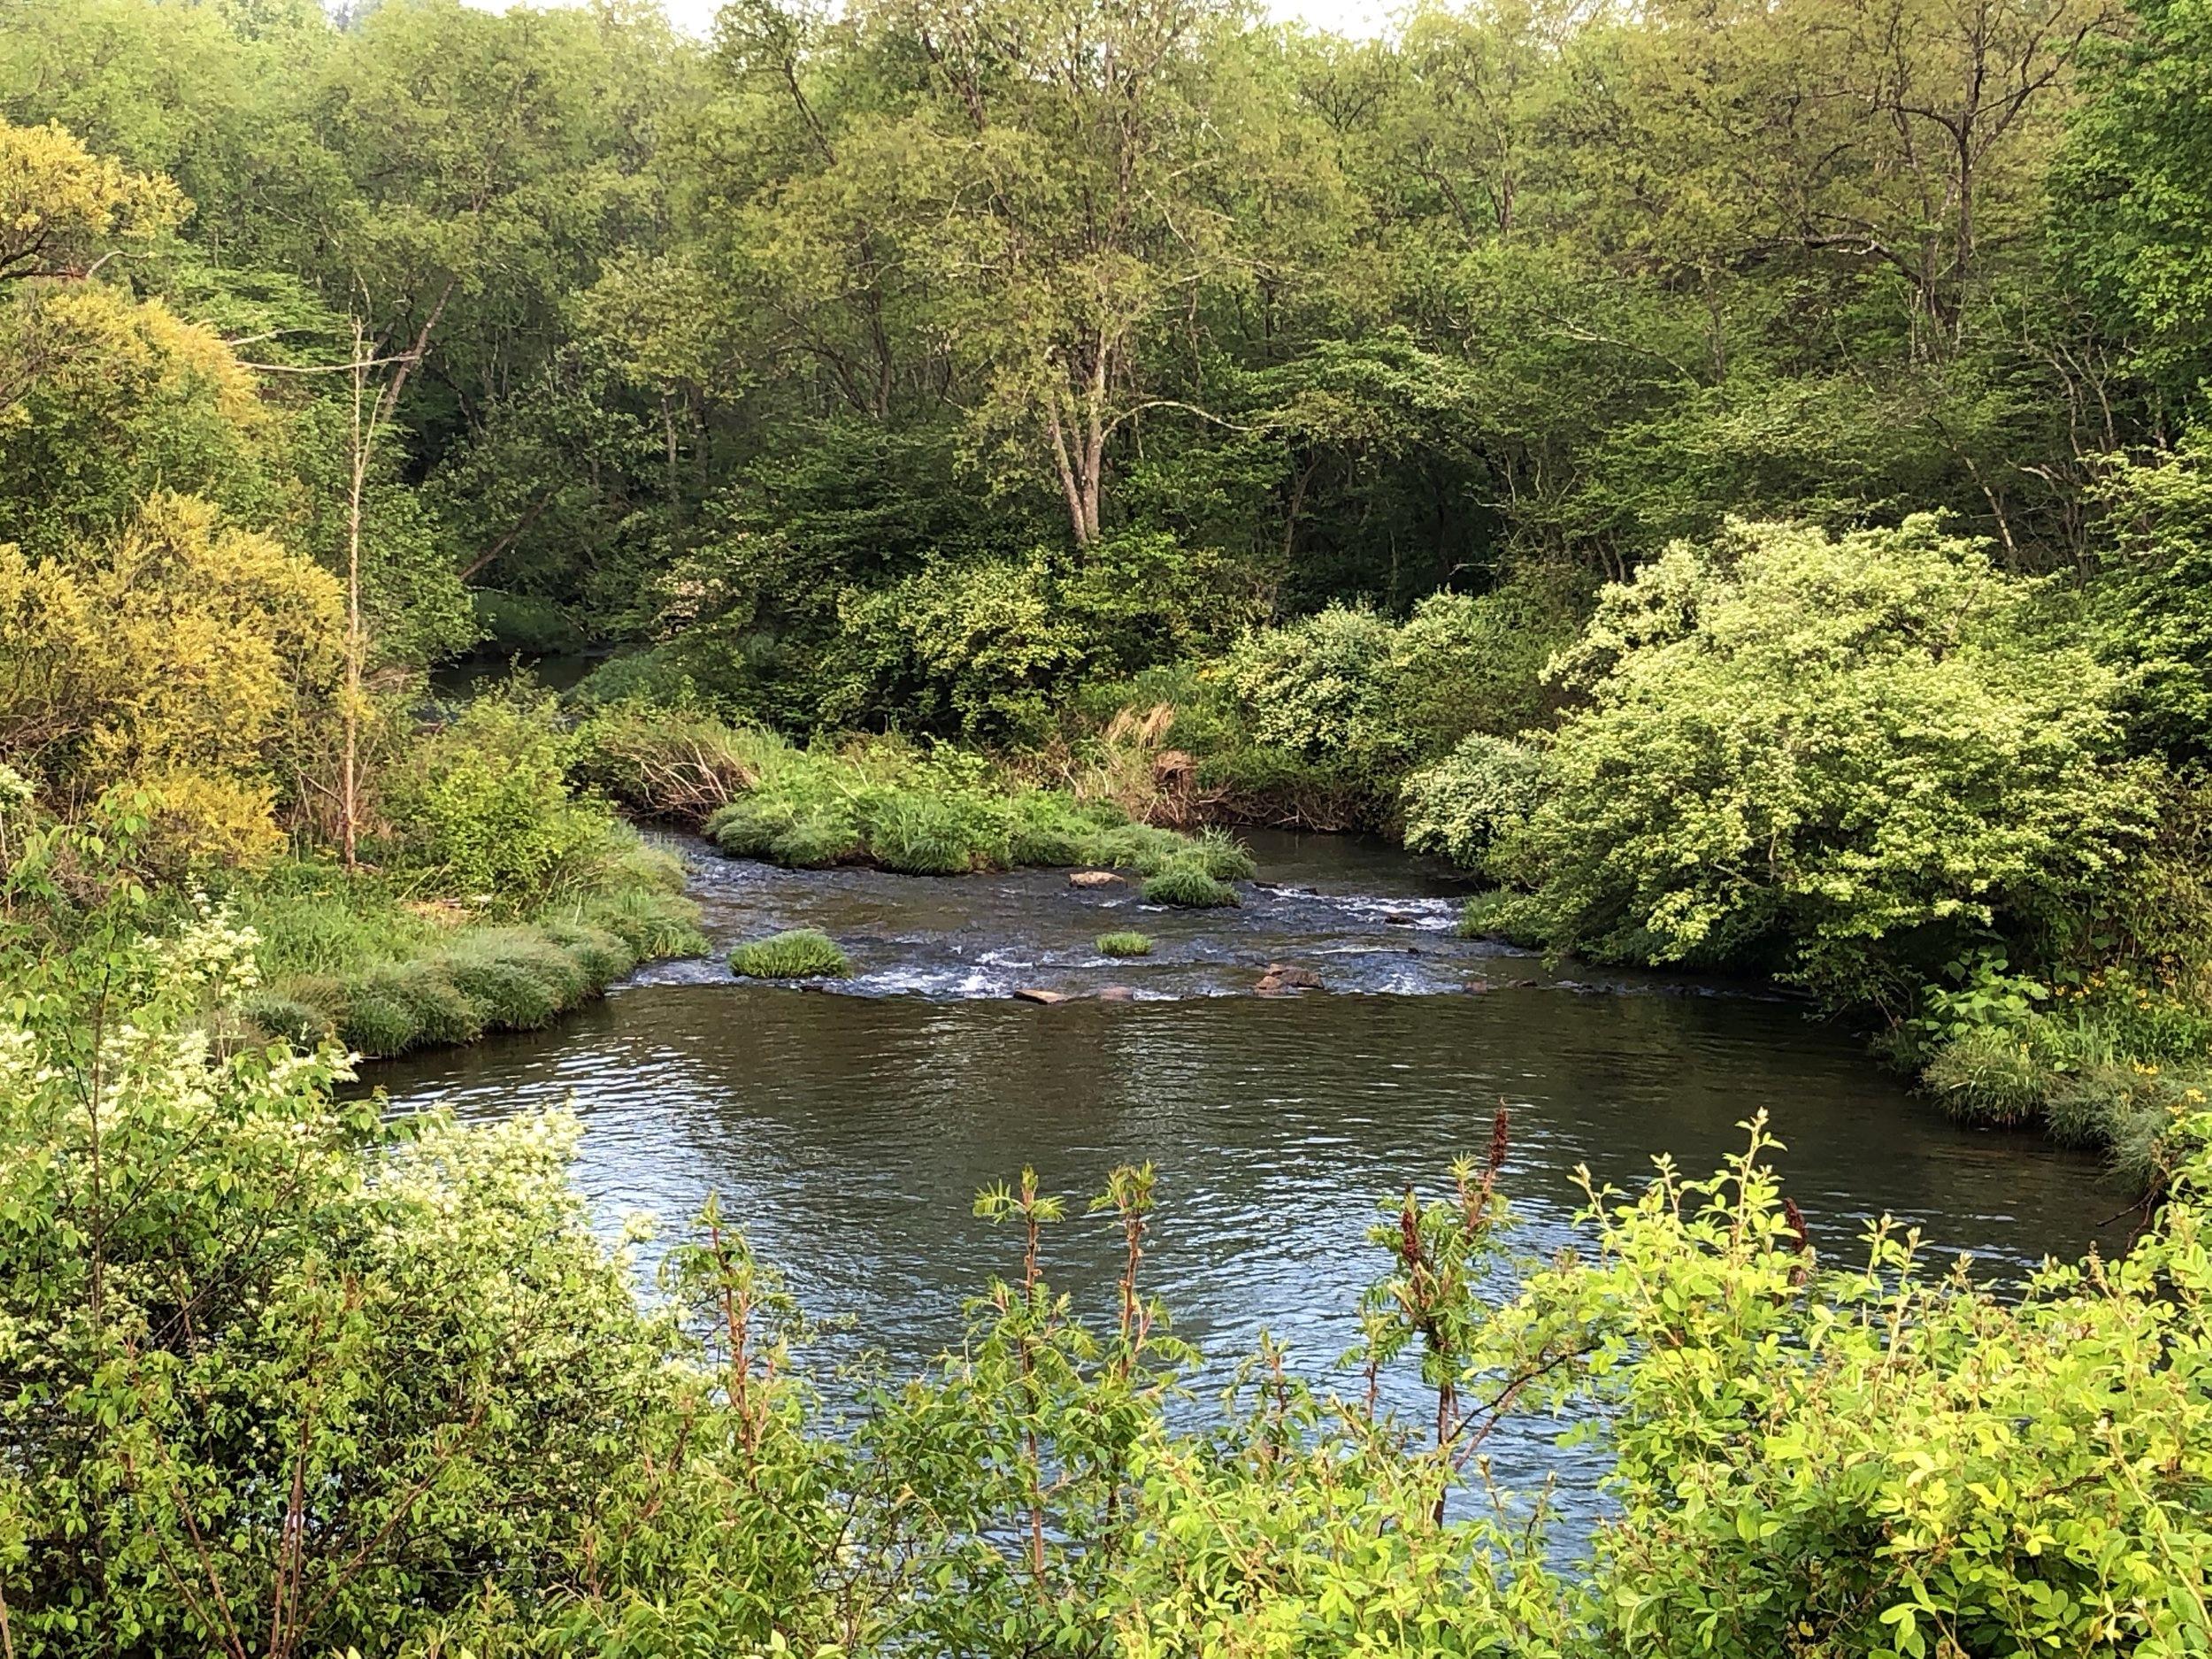 Piney Creek runs through the campground